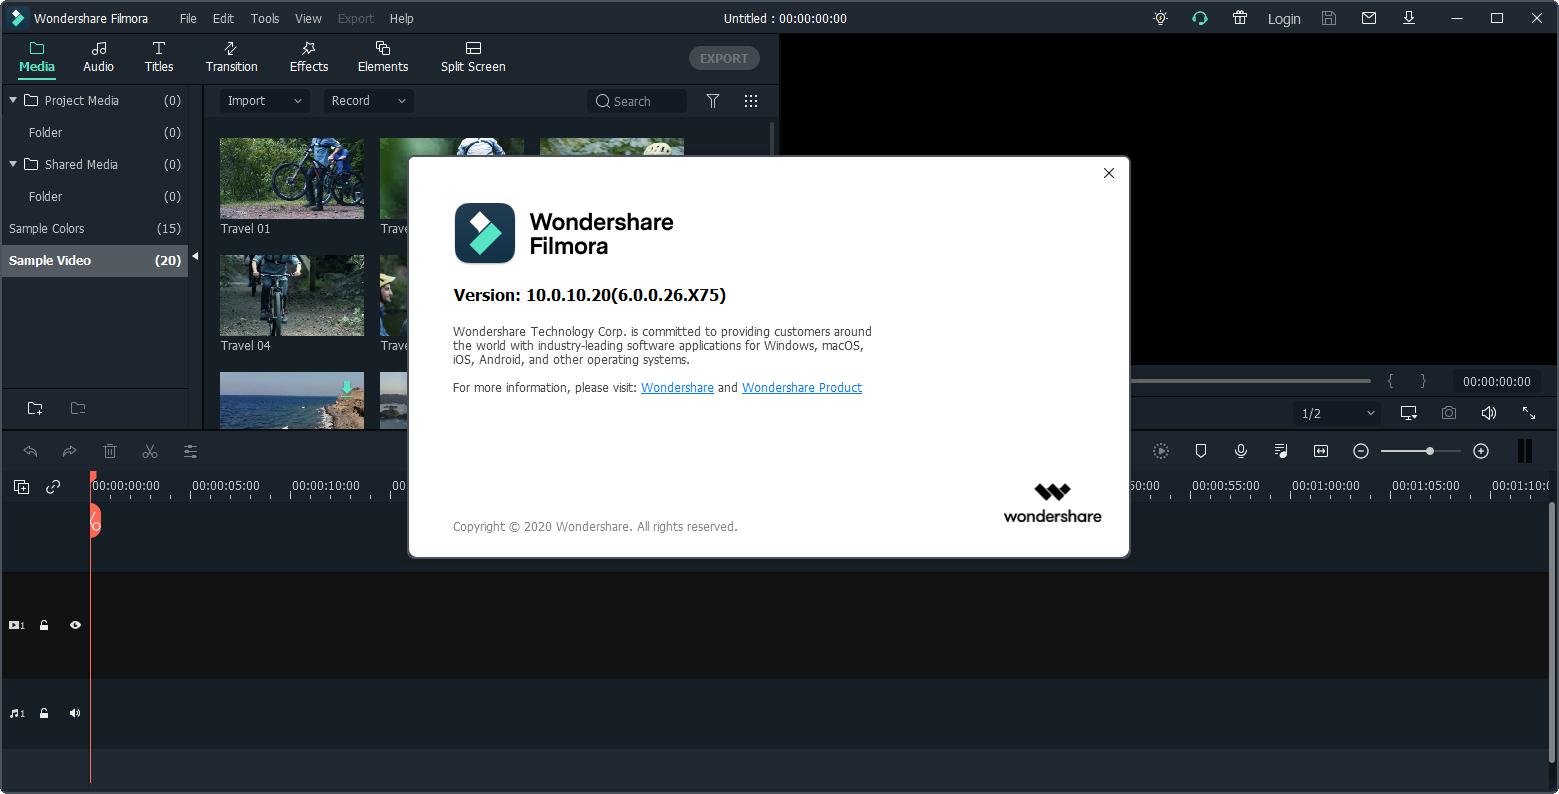 wondersharefilmorax10.0.10.20